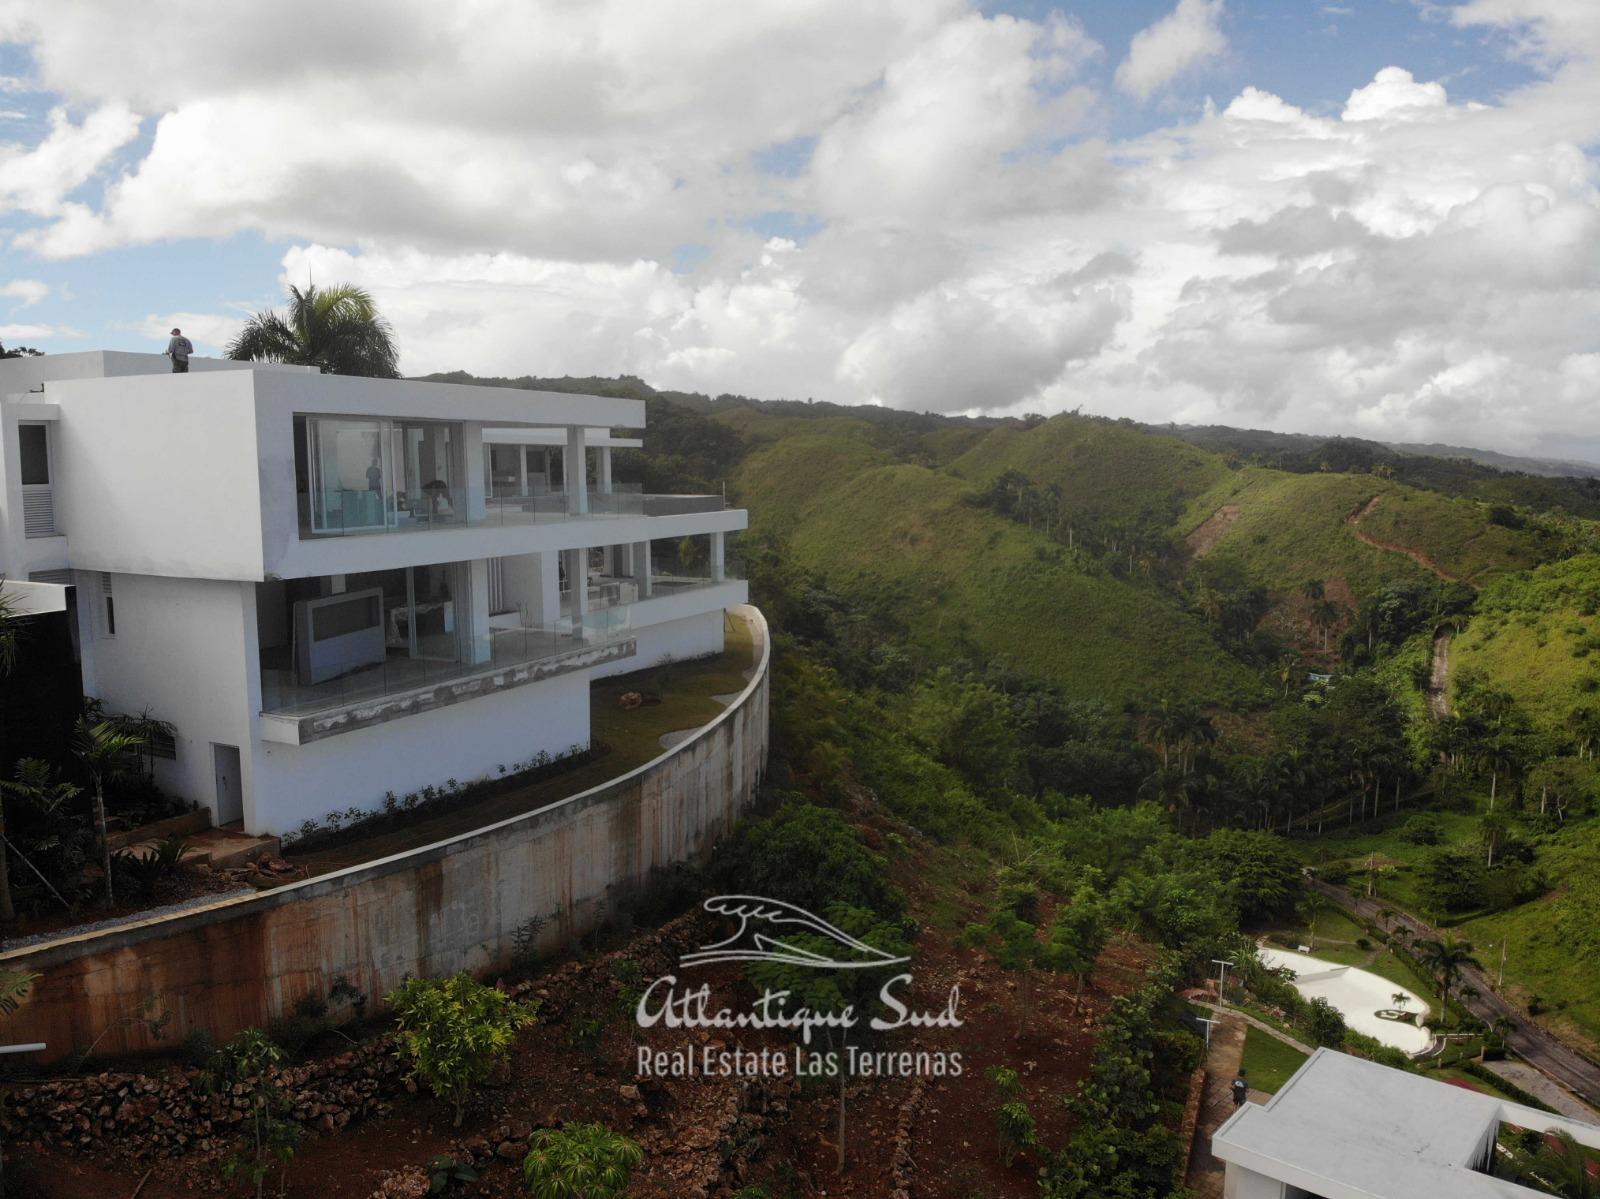 Hillside Lots for sale in Las Terrenas22.jpeg